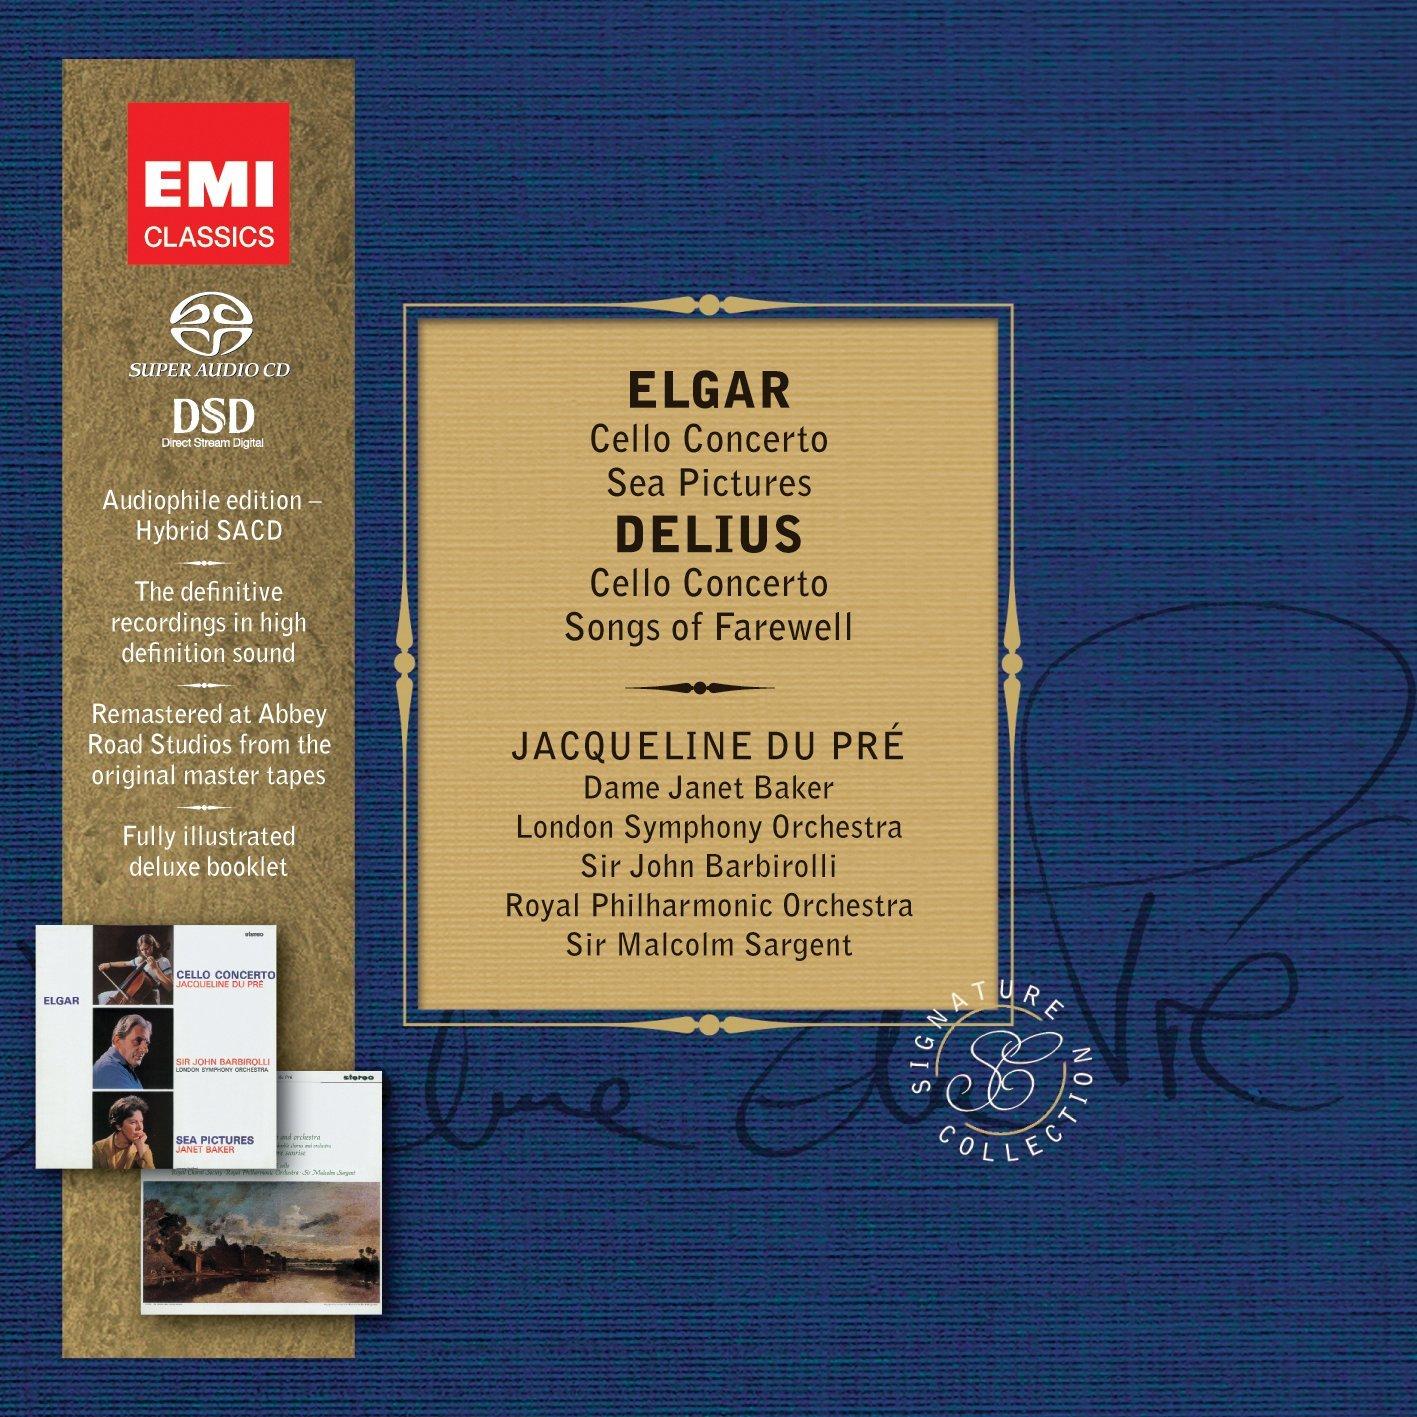 Sir John Barbirolli - Berlioz Symphonie Fantastique Opus 14